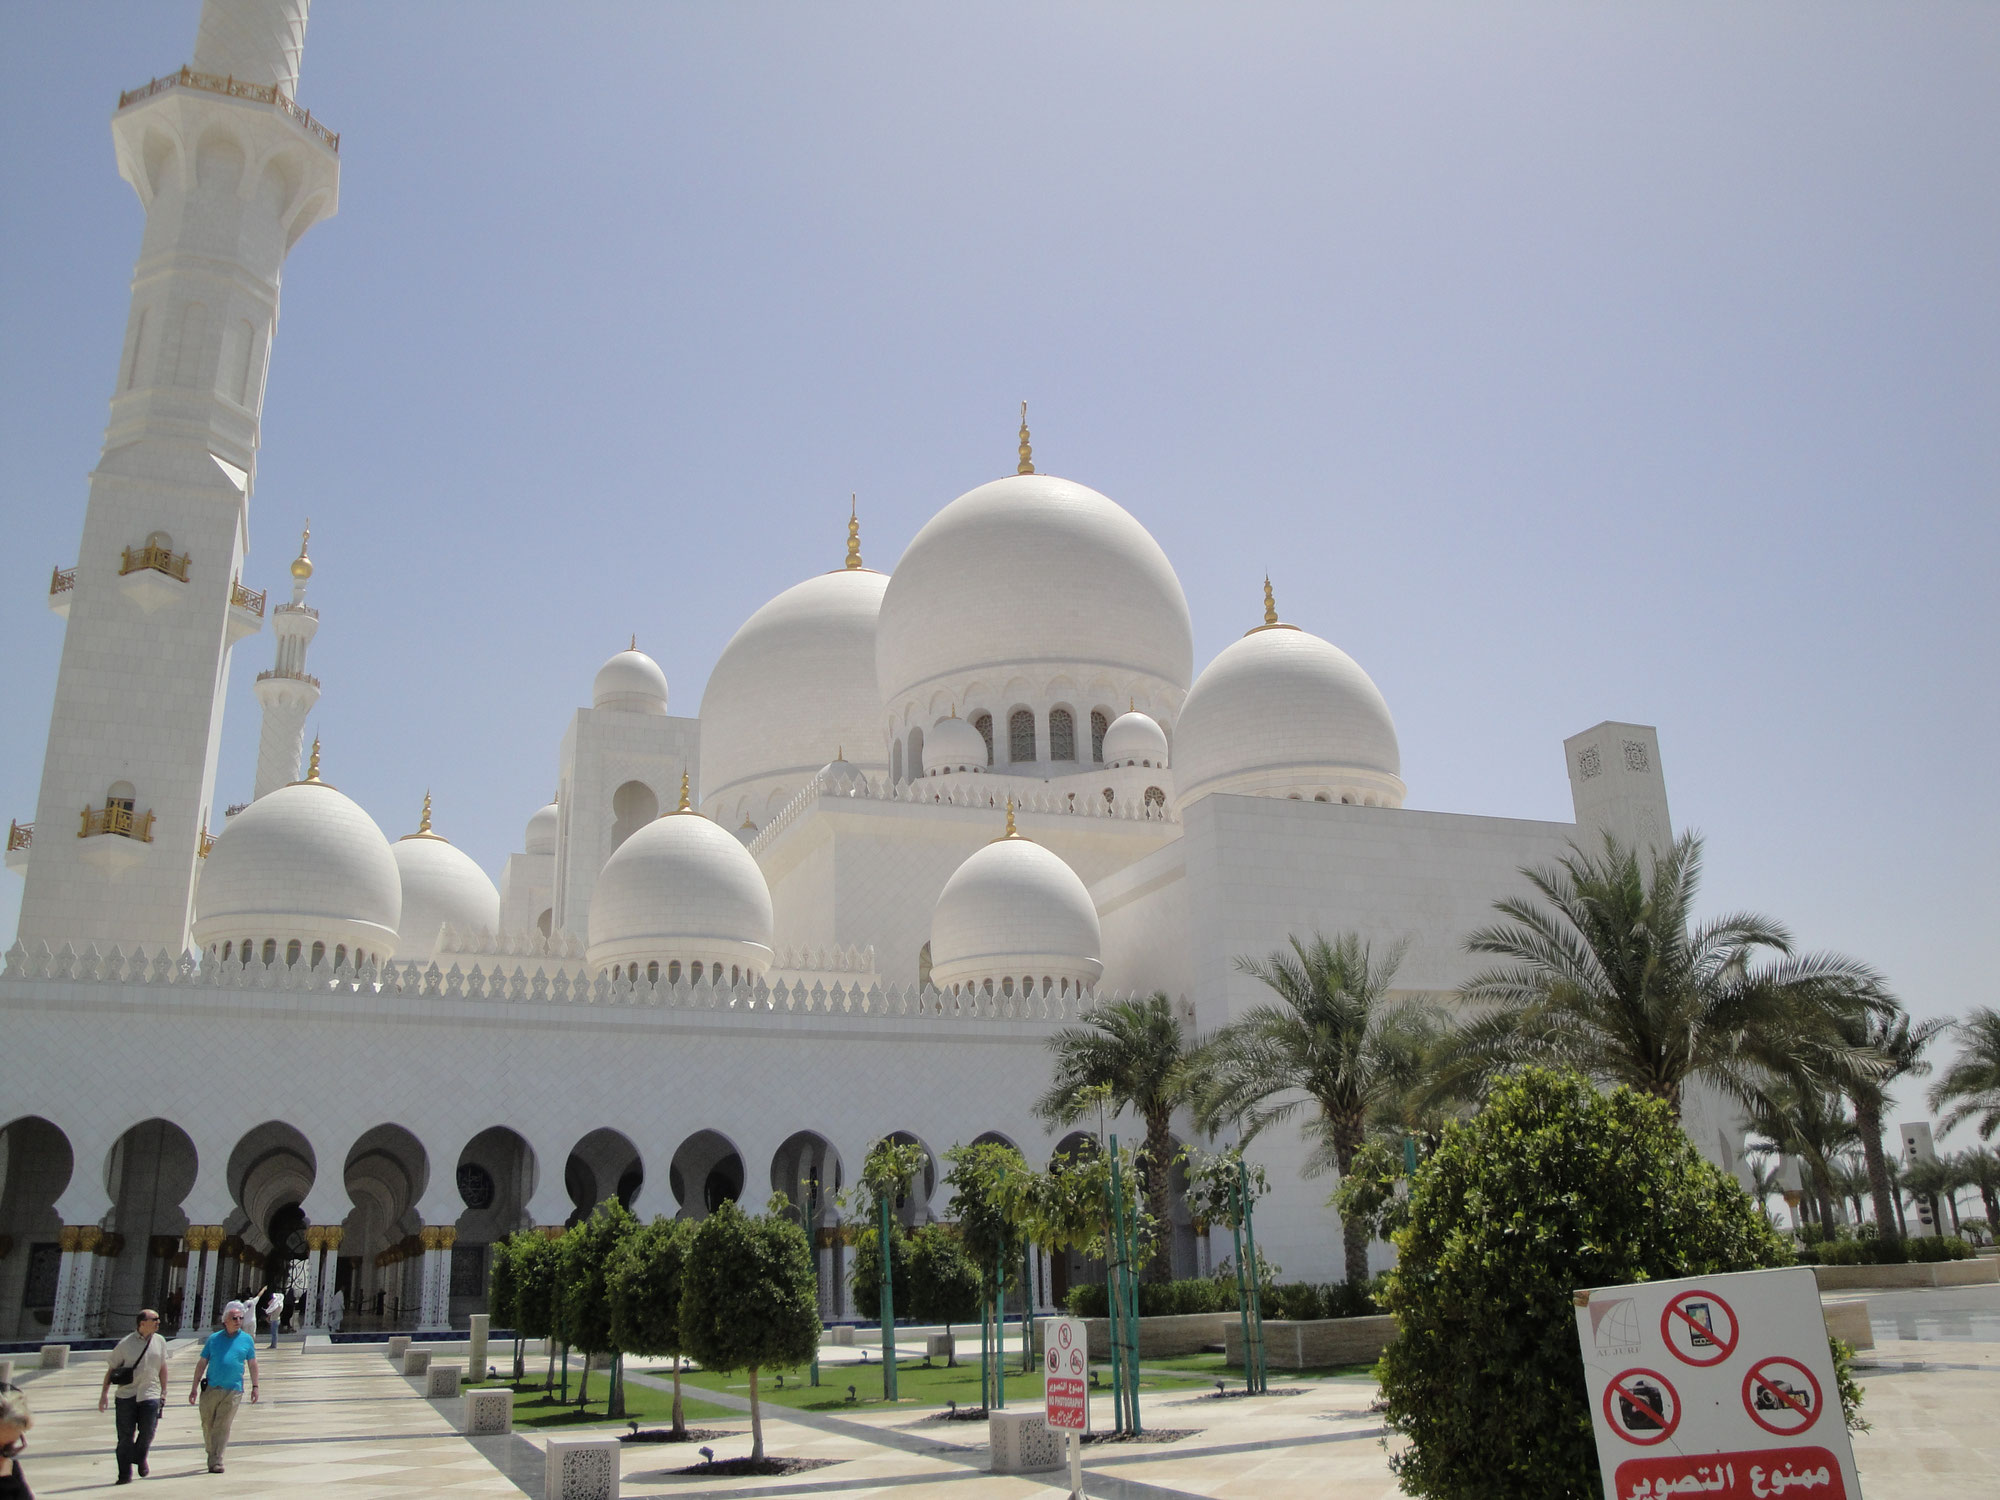 Abu Dhabi / Sir Bani Yas Island